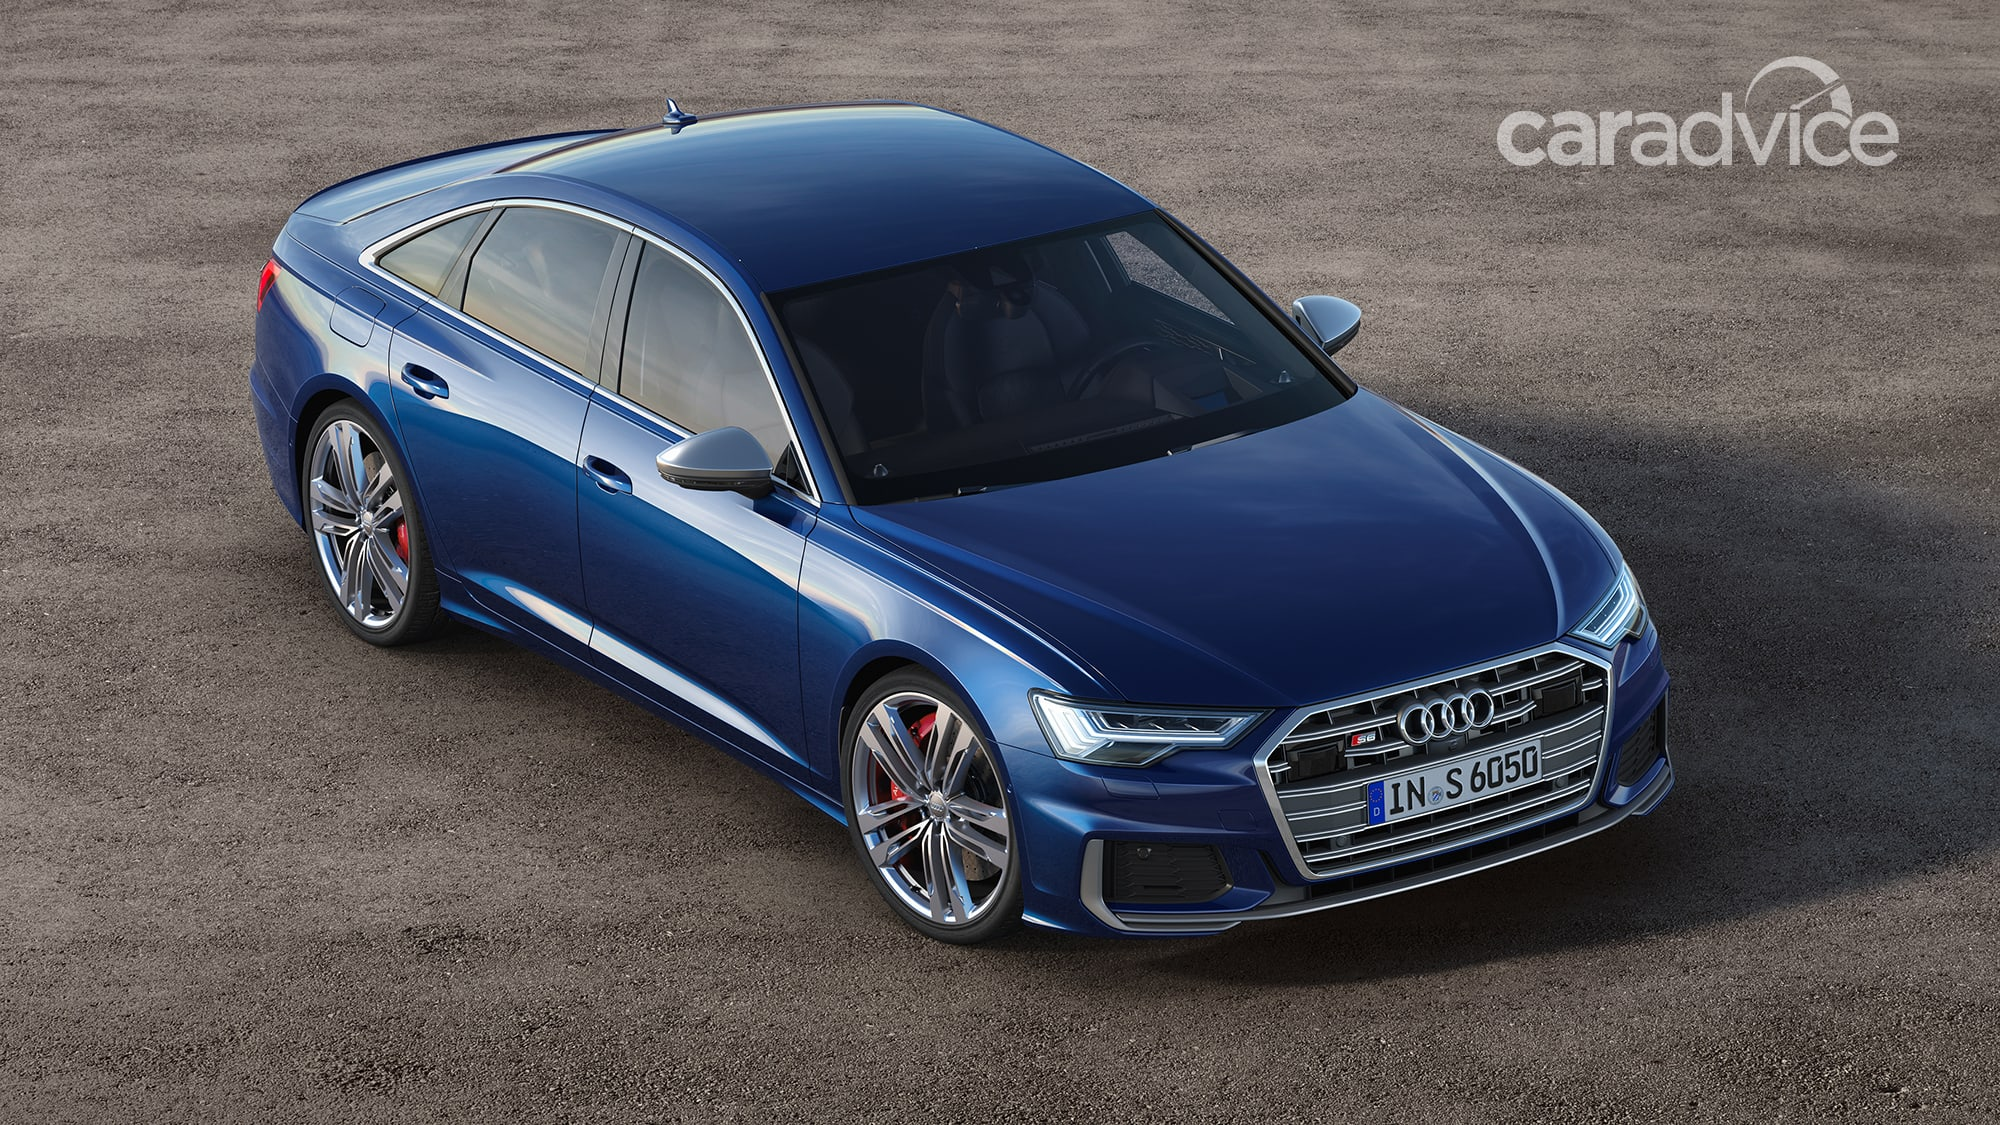 2017 - [Audi] A6 Berline & Avant [C8] - Page 11 Snczuciolpfv0yuhndiu